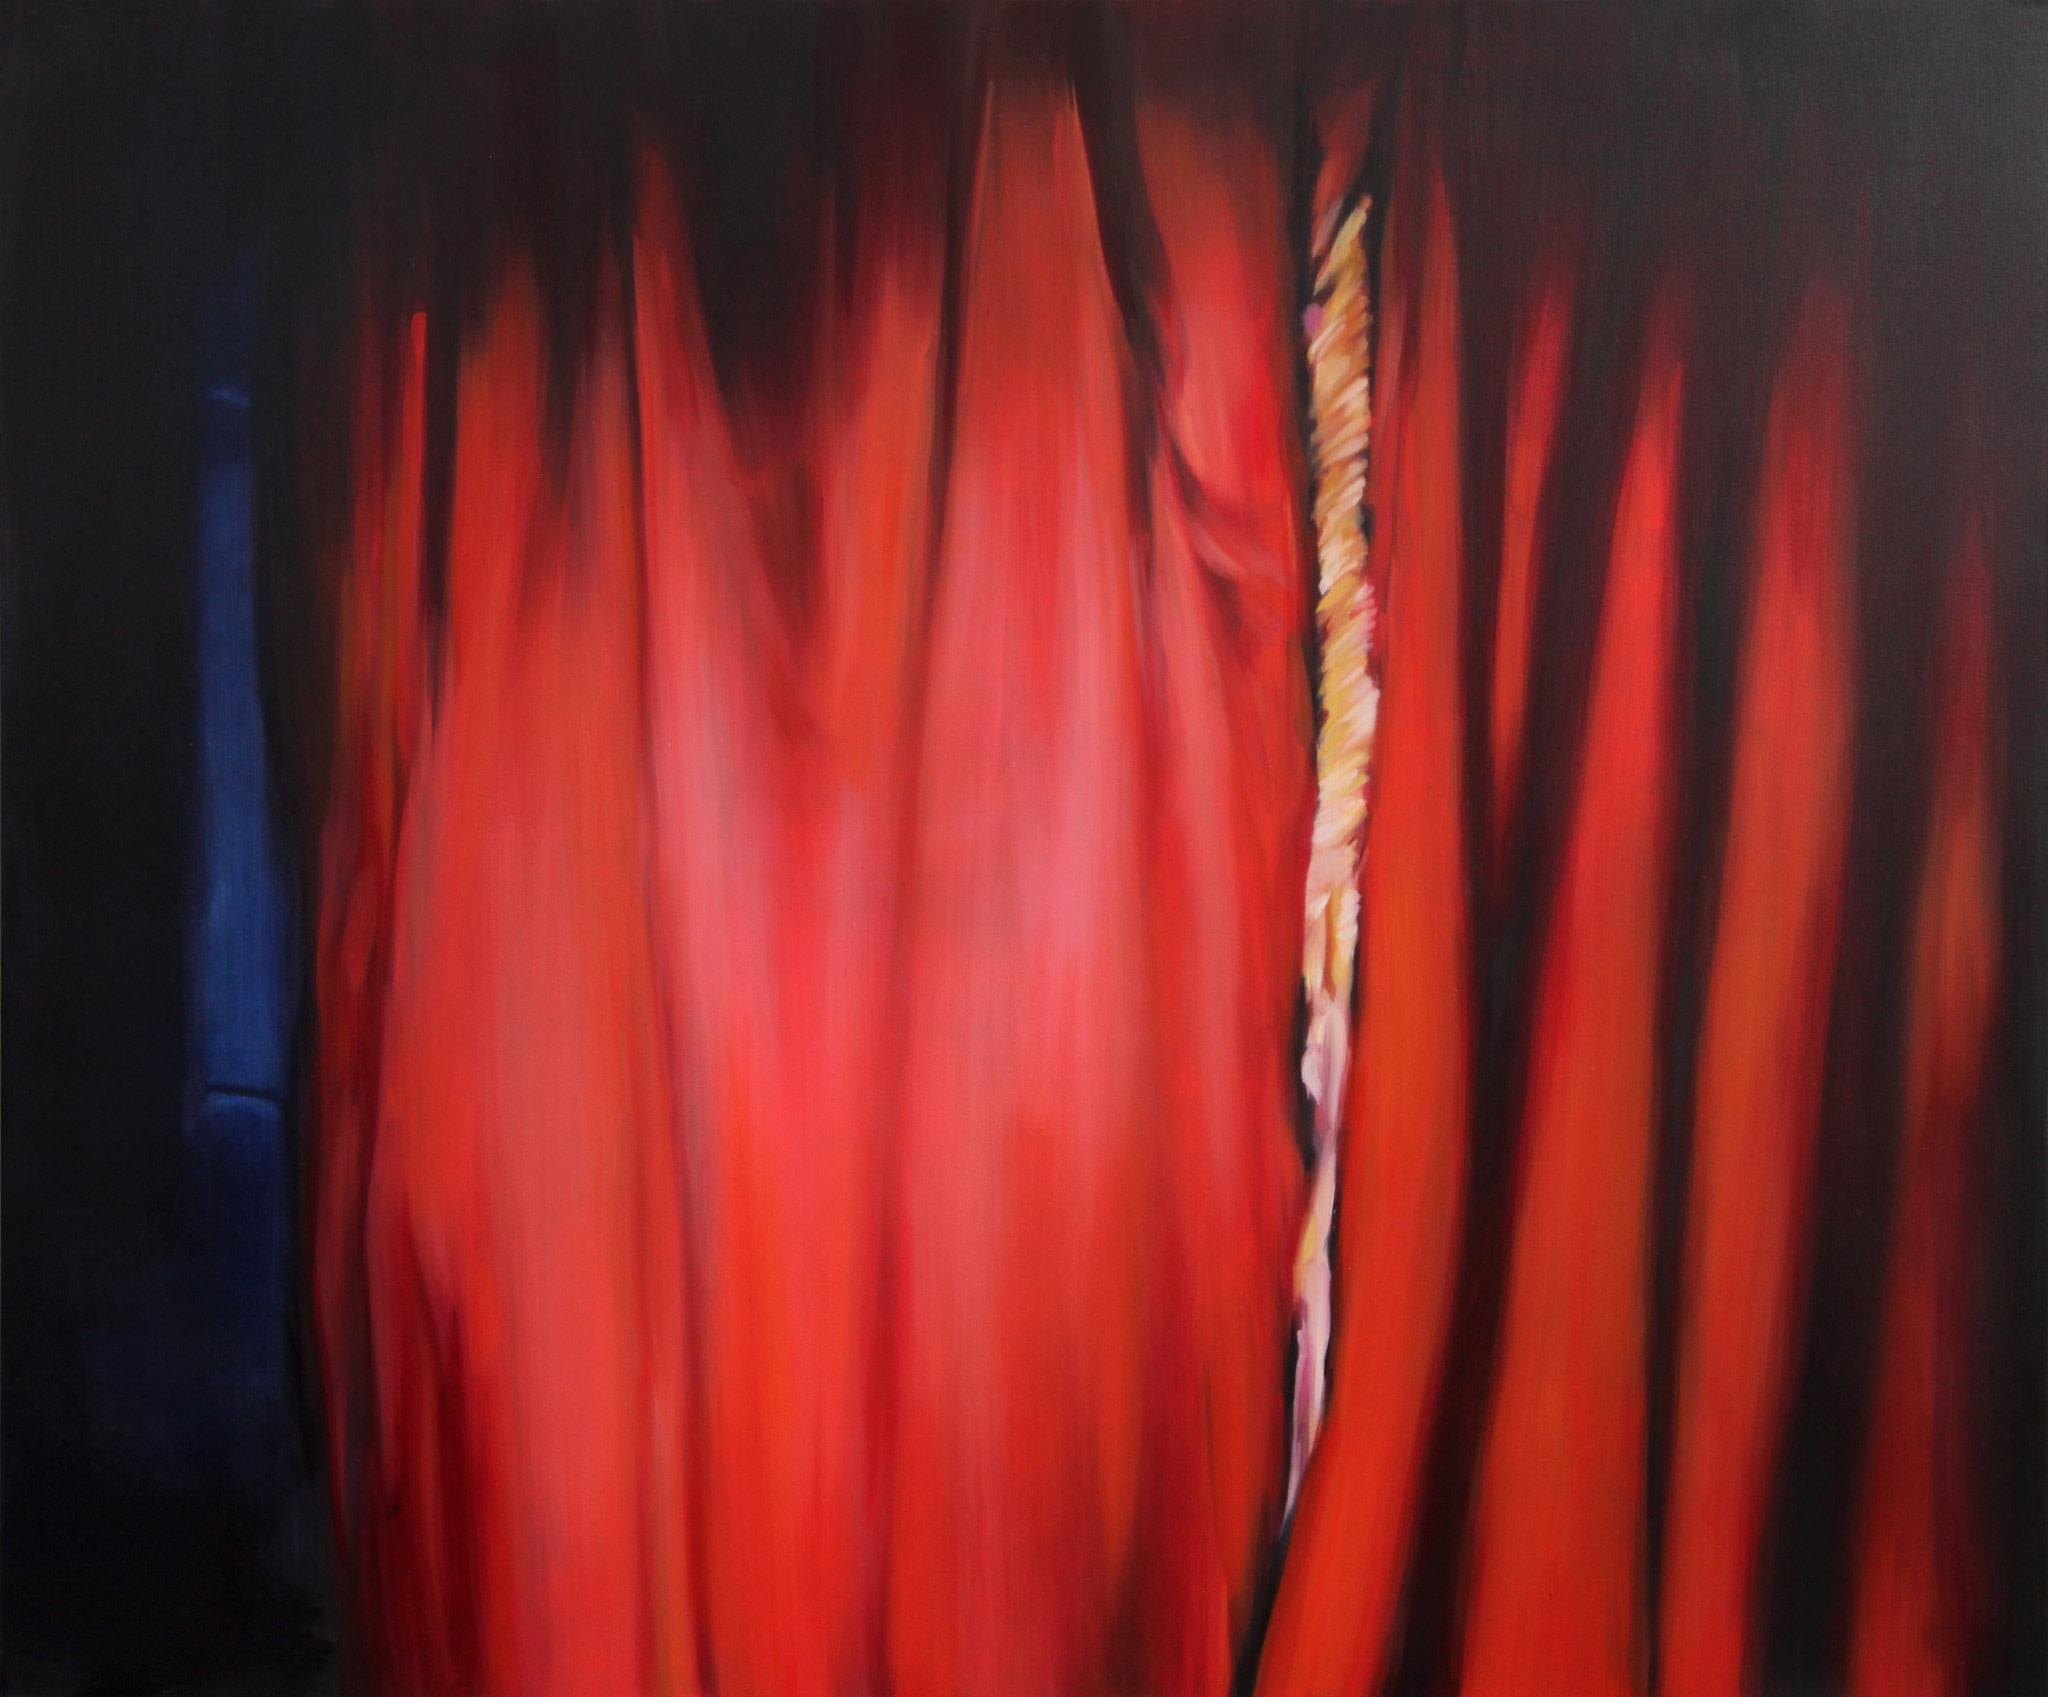 <span class=&#34;link fancybox-details-link&#34;><a href=&#34;/artists/14-rachel-lancaster/works/8787/&#34;>View Detail Page</a></span><div class=&#34;artist&#34;><strong>Rachel Lancaster</strong></div> <div class=&#34;title&#34;>untitled, 2015</div> <div class=&#34;medium&#34;>Oil on canvas</div> <div class=&#34;dimensions&#34;>154 x 183 cm<br />60 5/8 x 72 1/8 in</div><div class=&#34;copyright_line&#34;>Copyright The Artist</div>